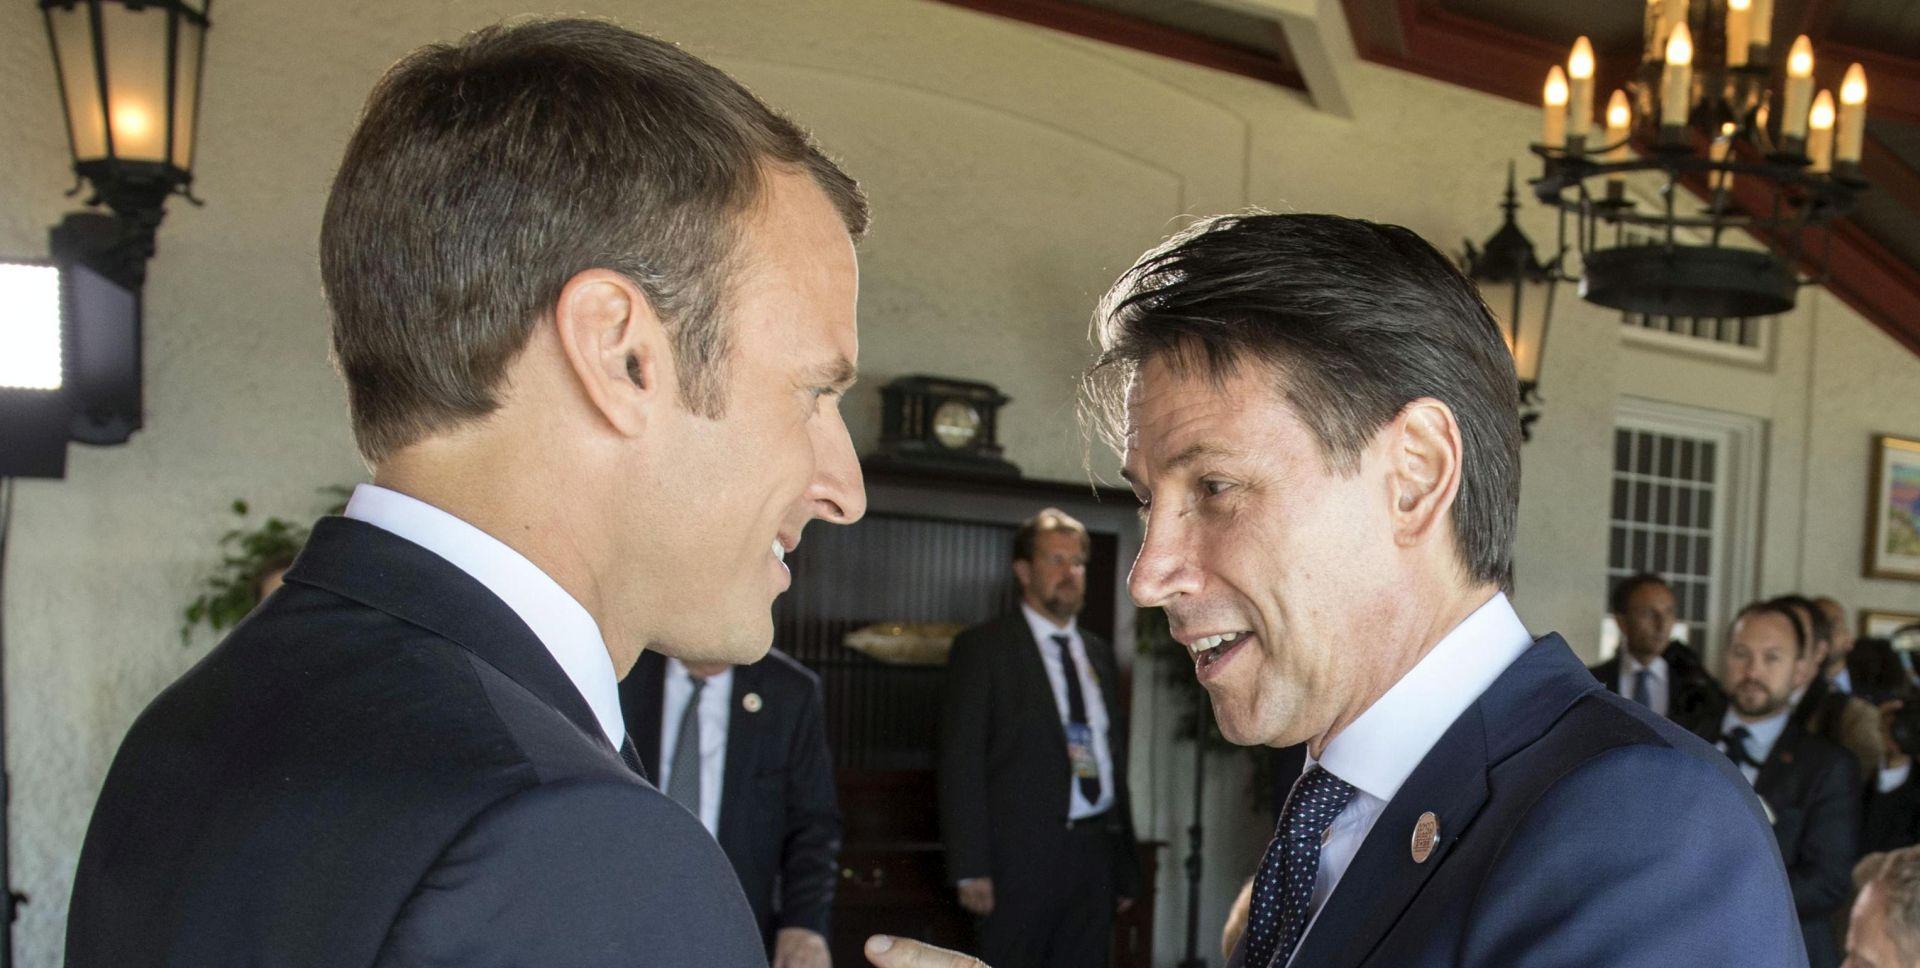 Ipak sastanak Conte-Macron